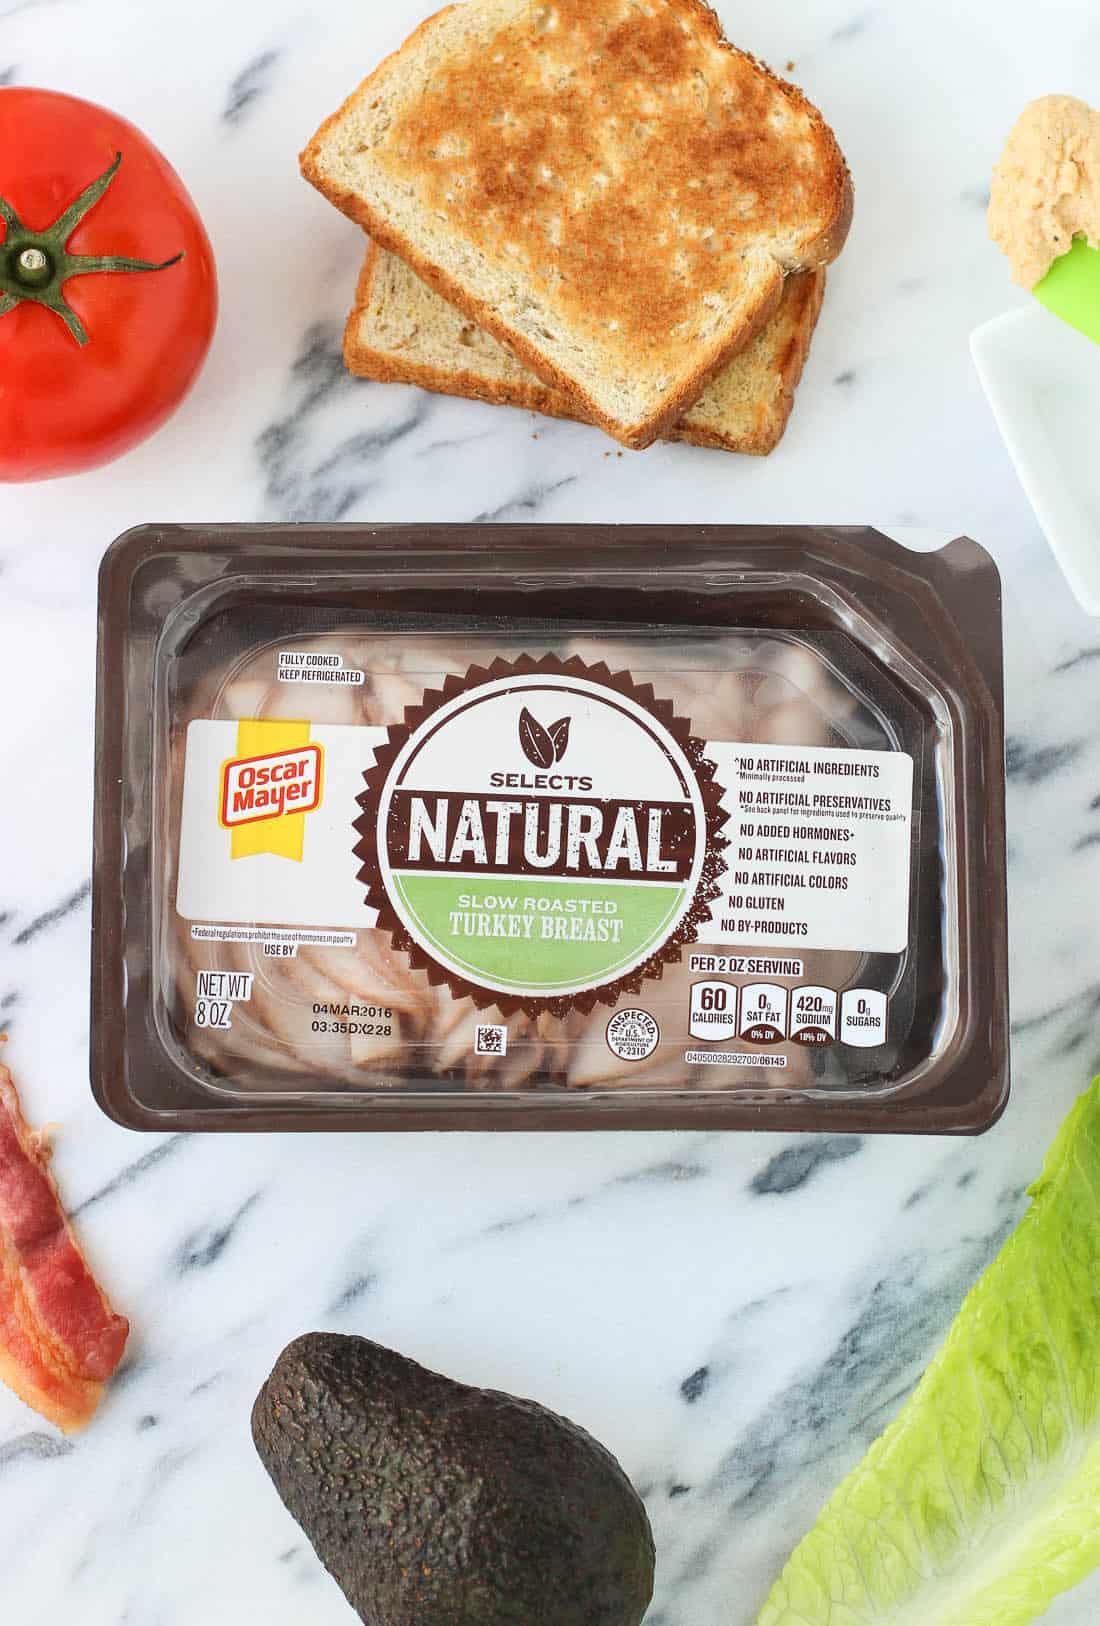 This hummus avocado turkey club sandwich features juicy tomato, bacon, turkey, mashed avocado, and creamy hummus, all on multigrain bread.